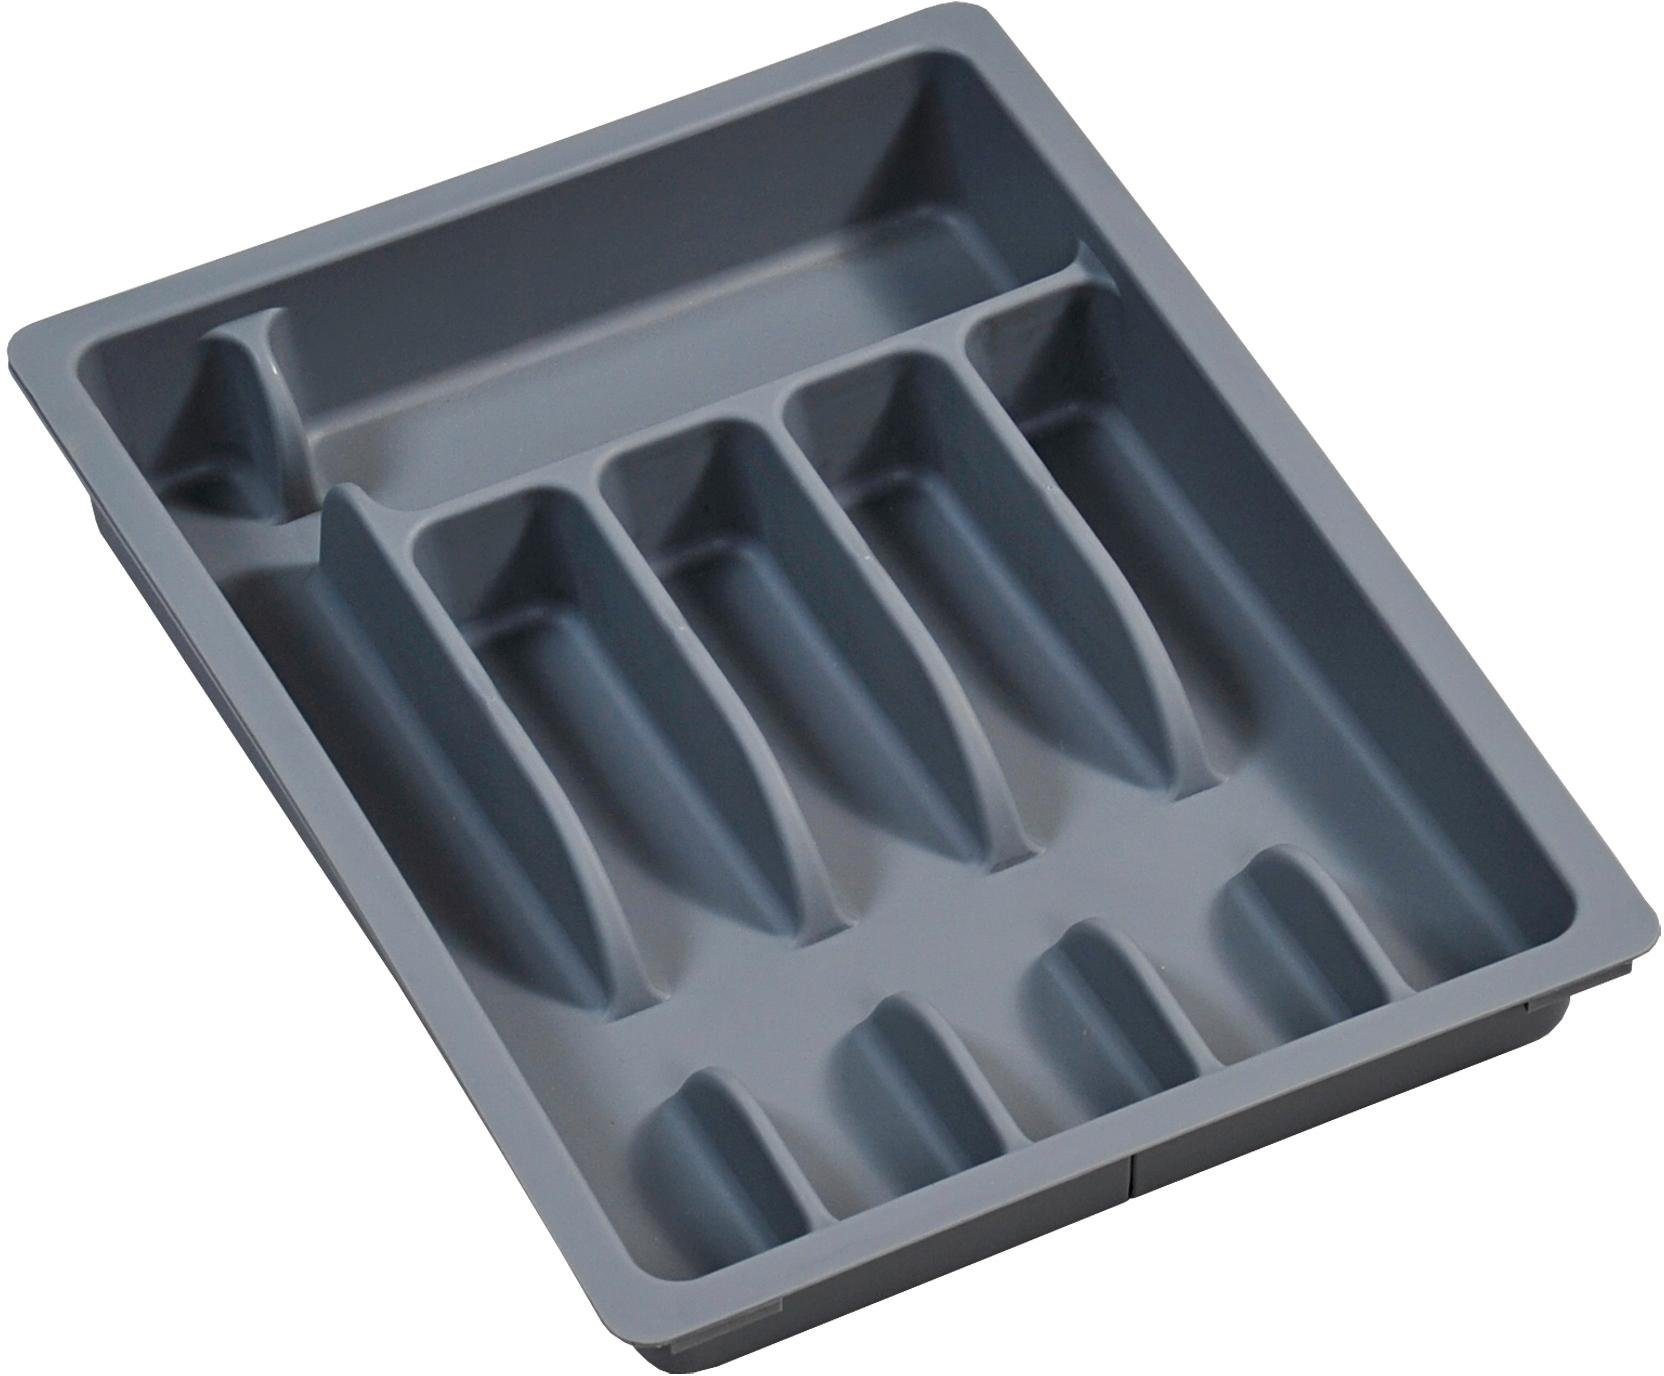 KESPER Besteckkasten, variabel, ausziehbar, Kunststoff